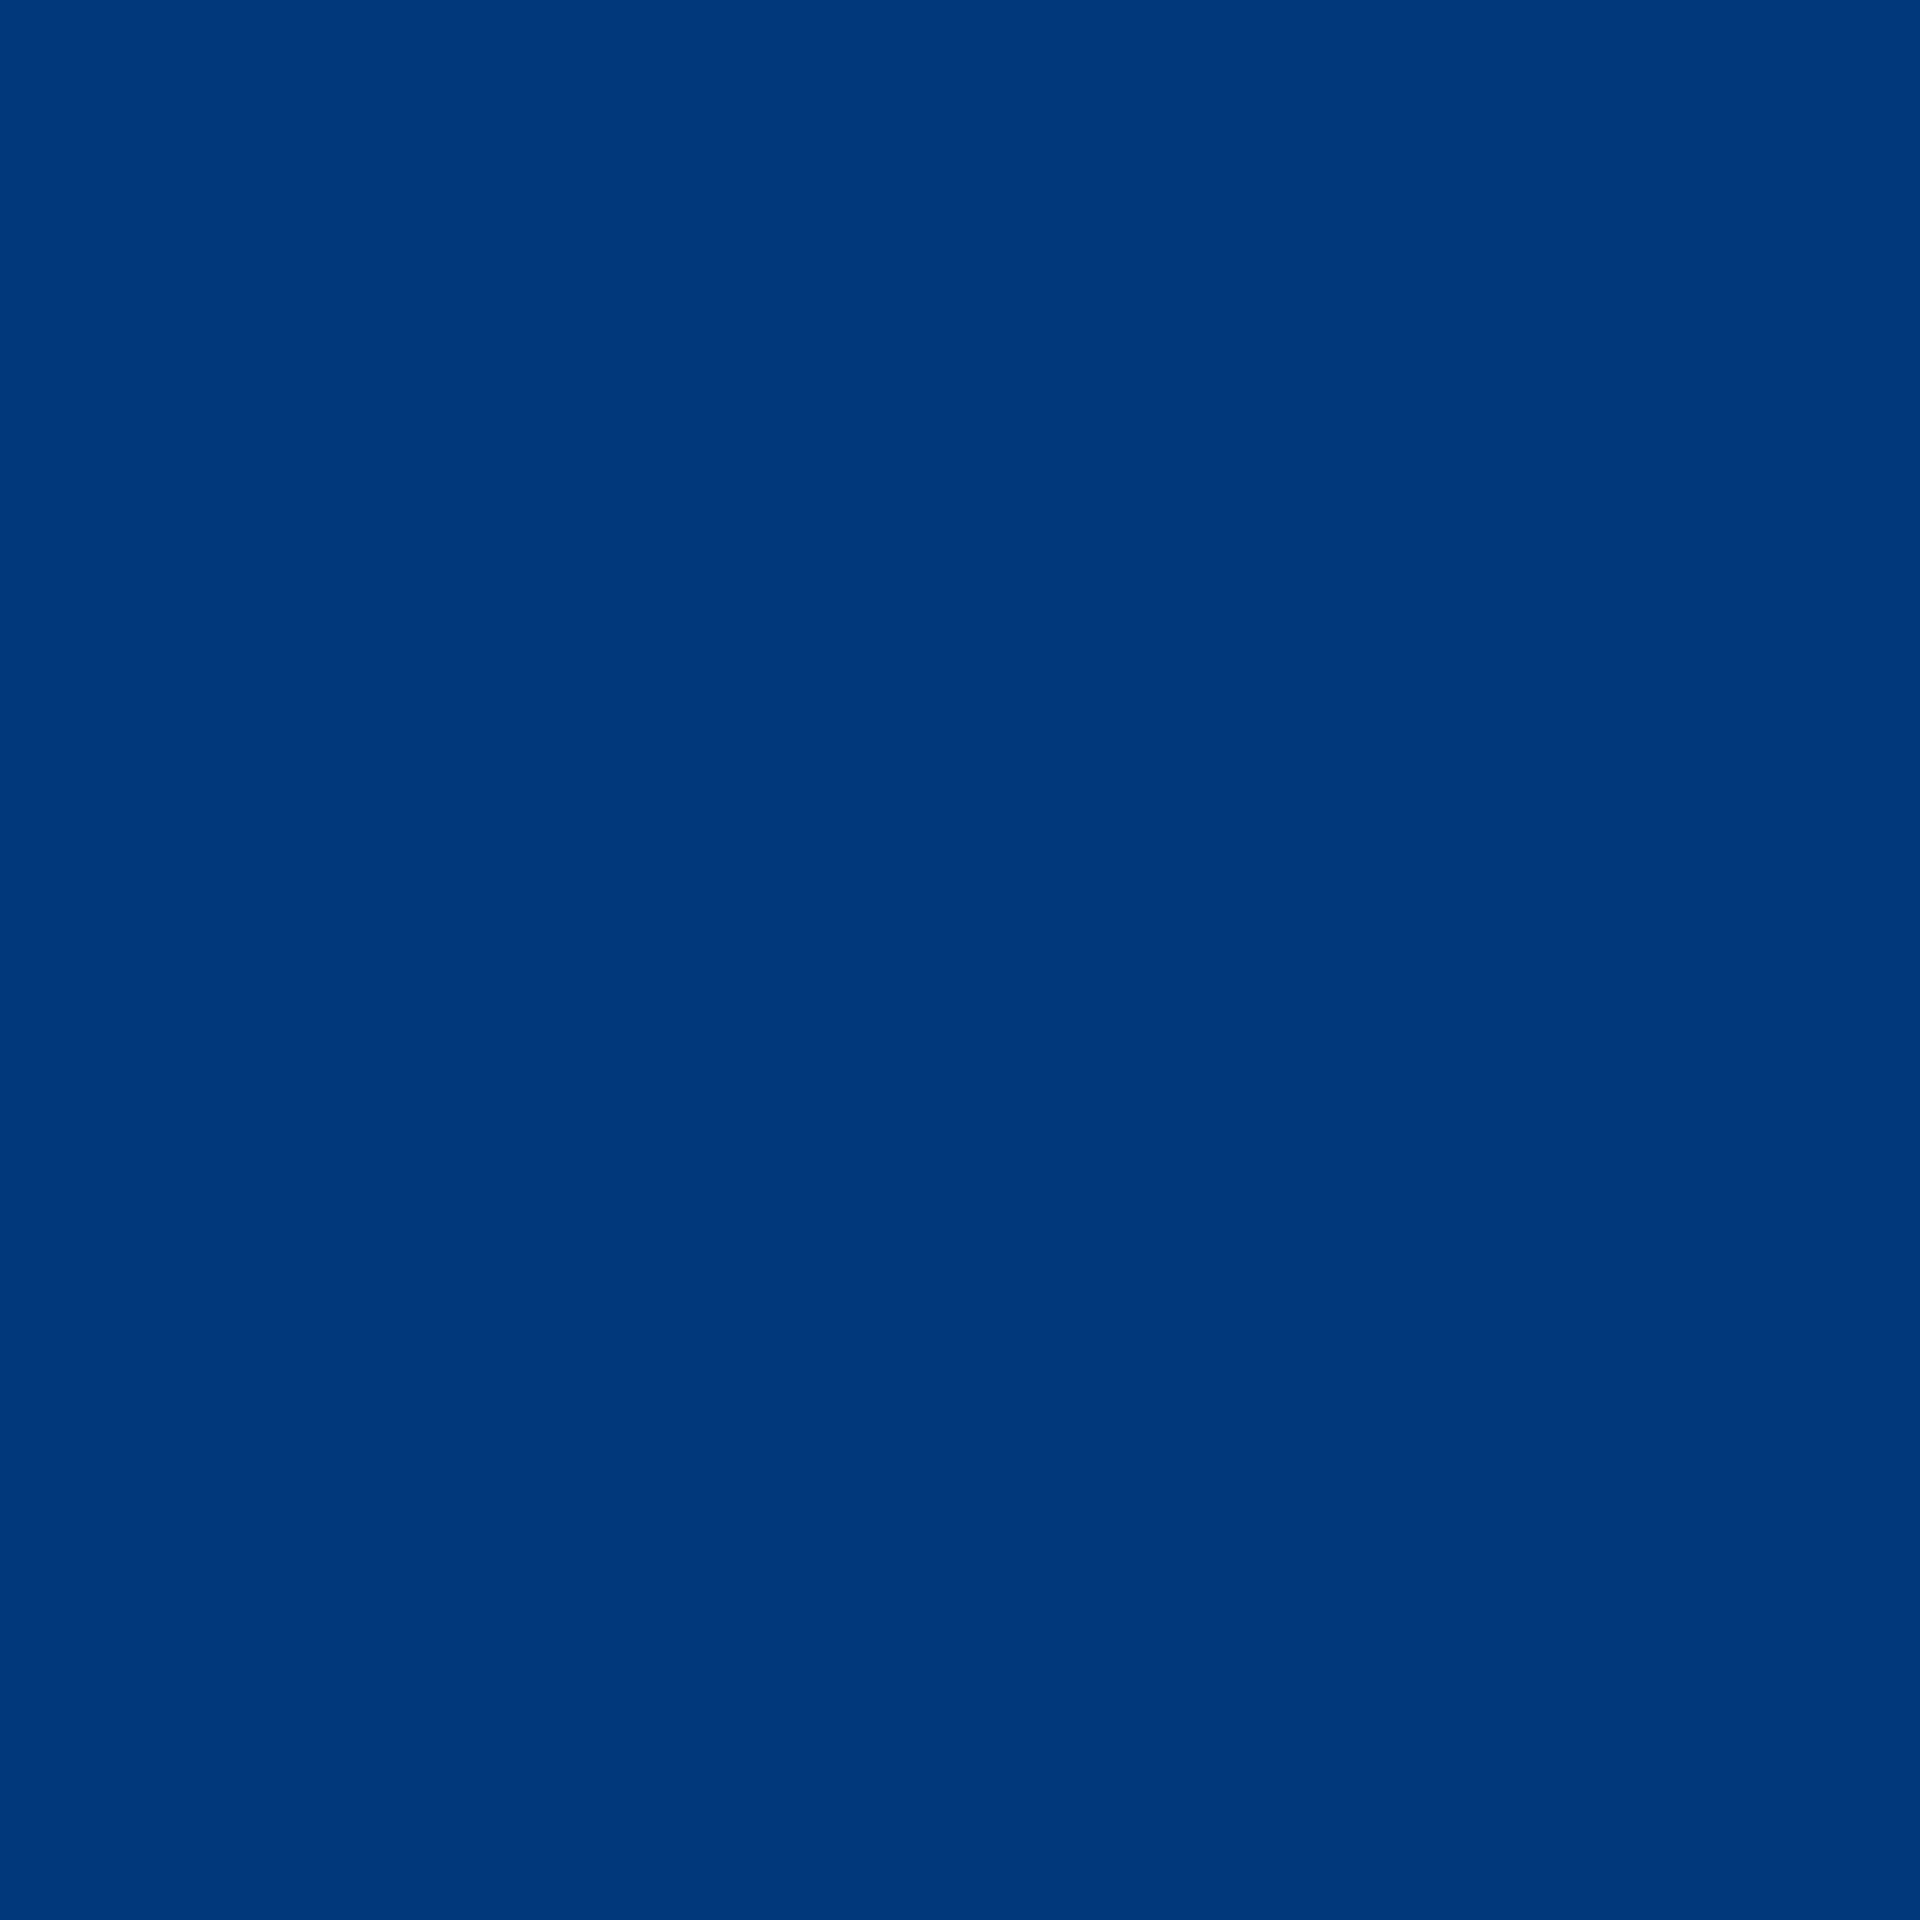 Modrá RAL 5002